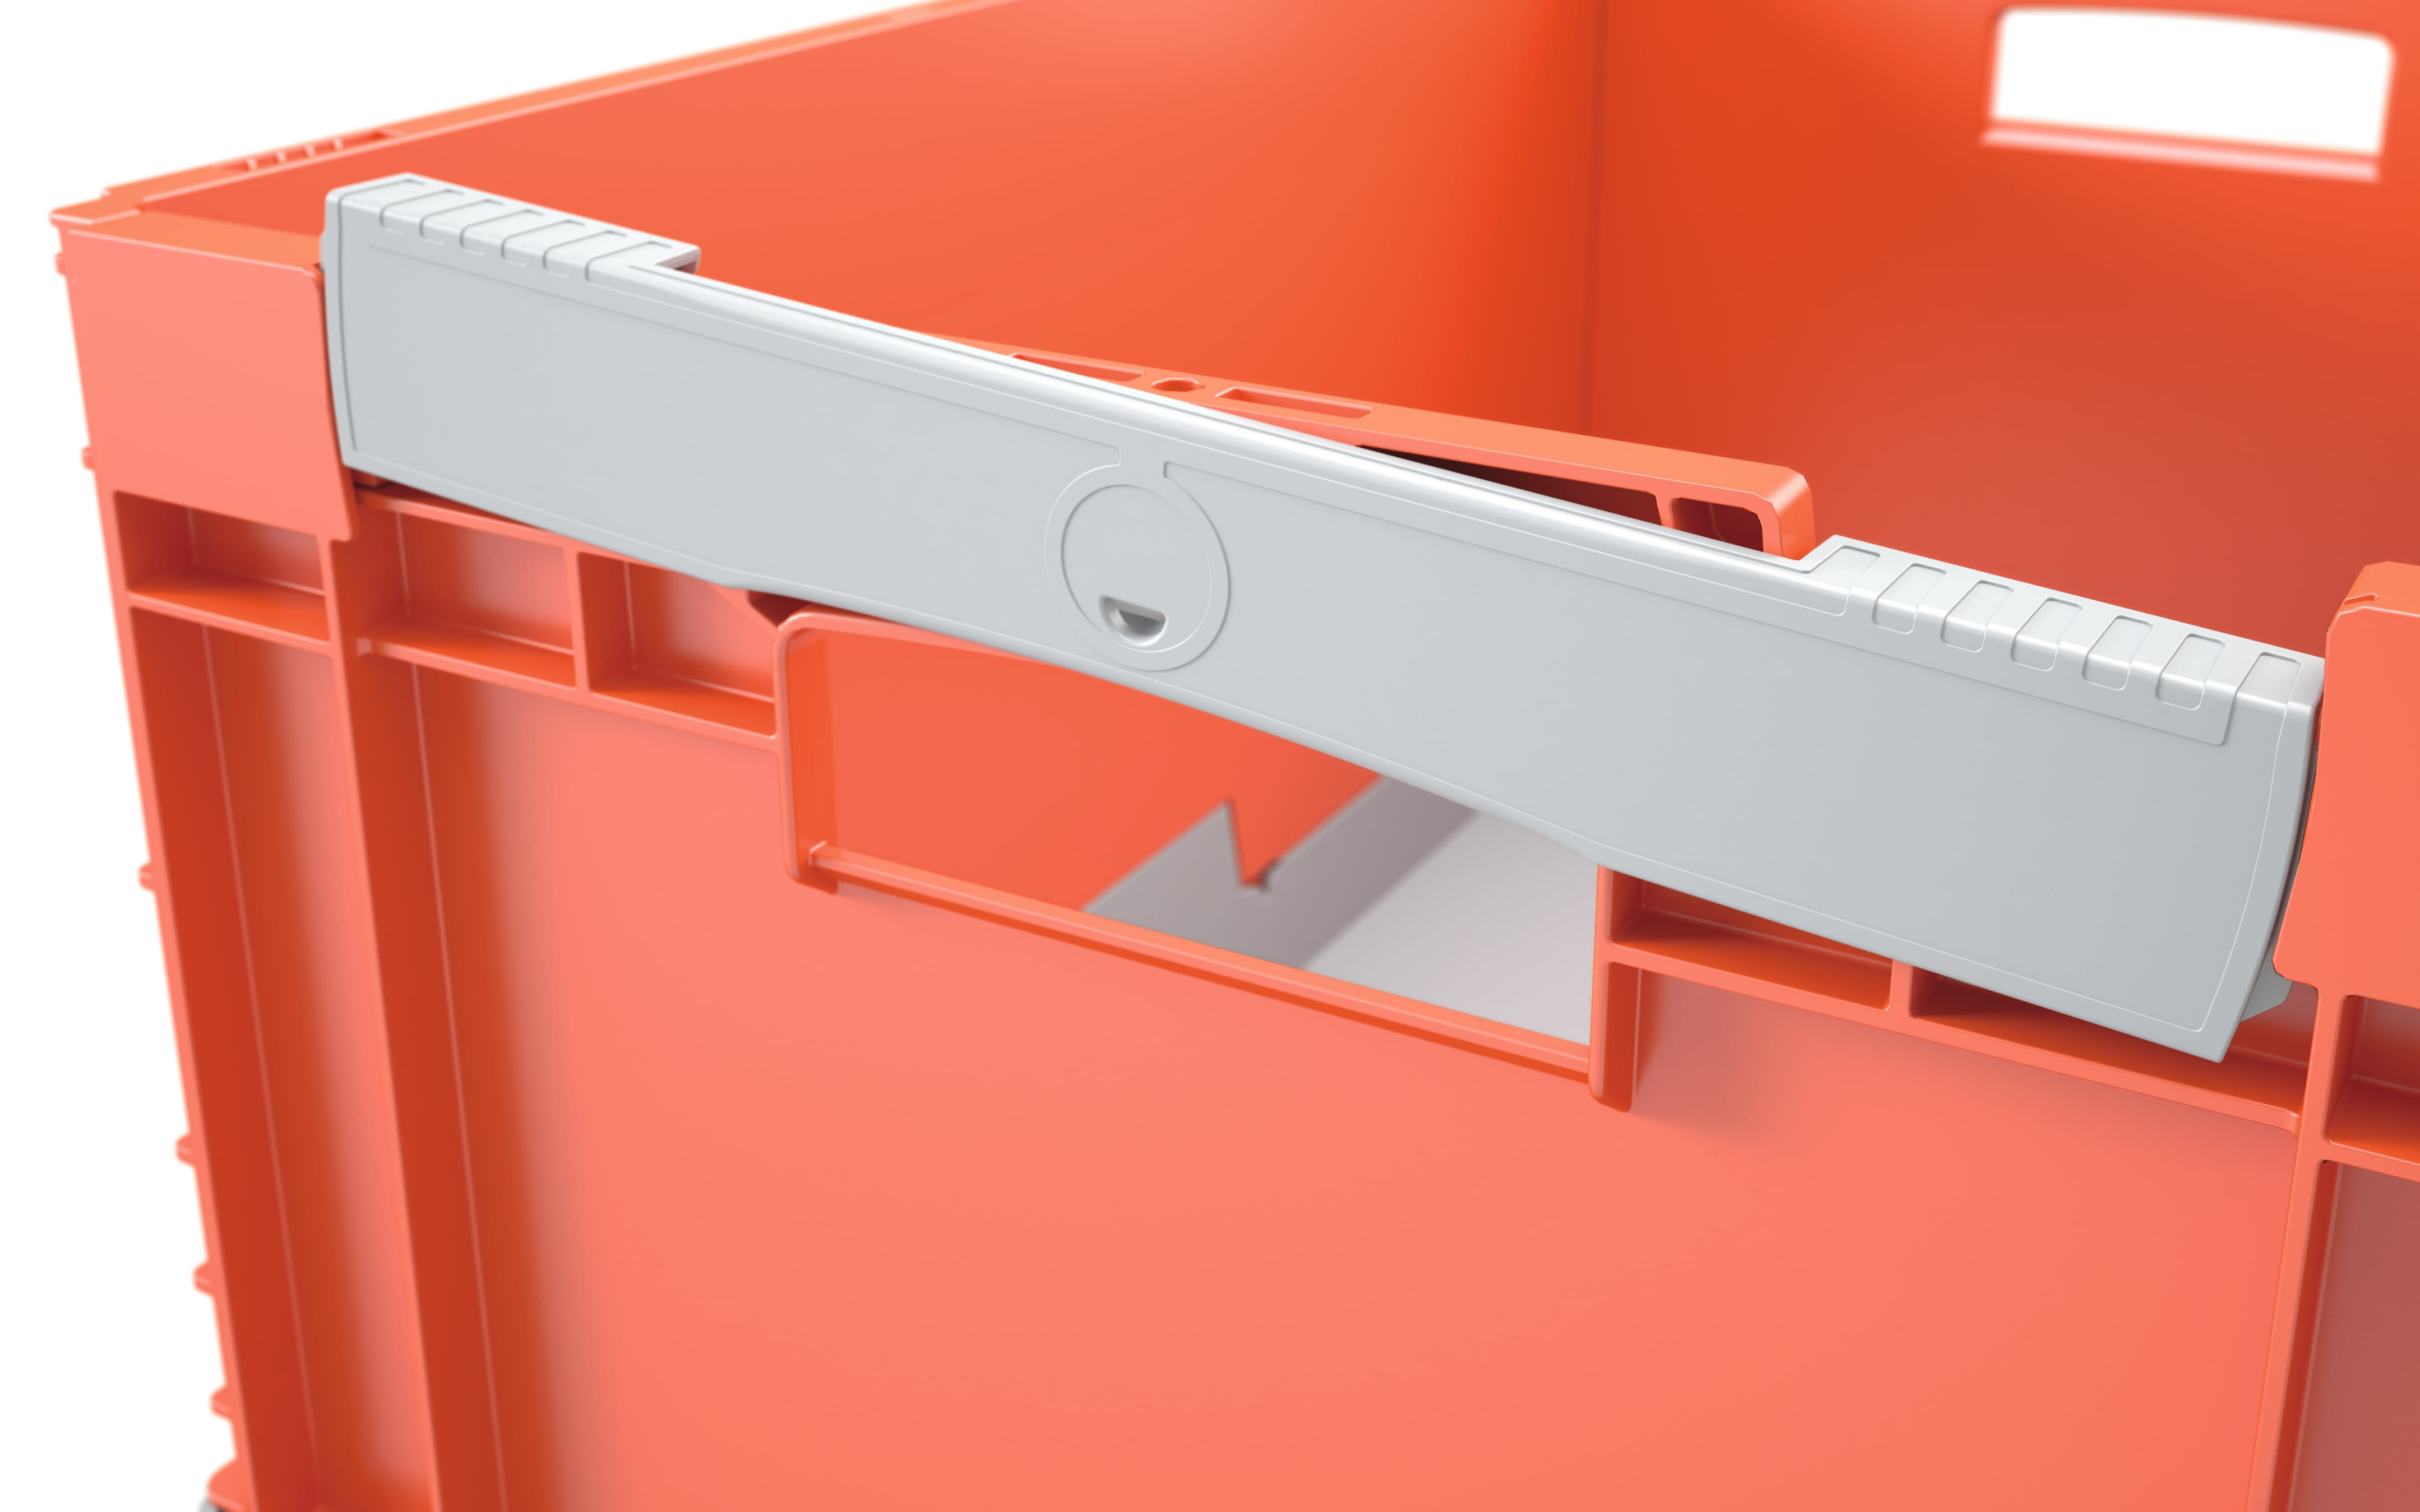 Skládací BITOBOX EQ, uchopovací otvory, oranžová/šedá, IMG_133426